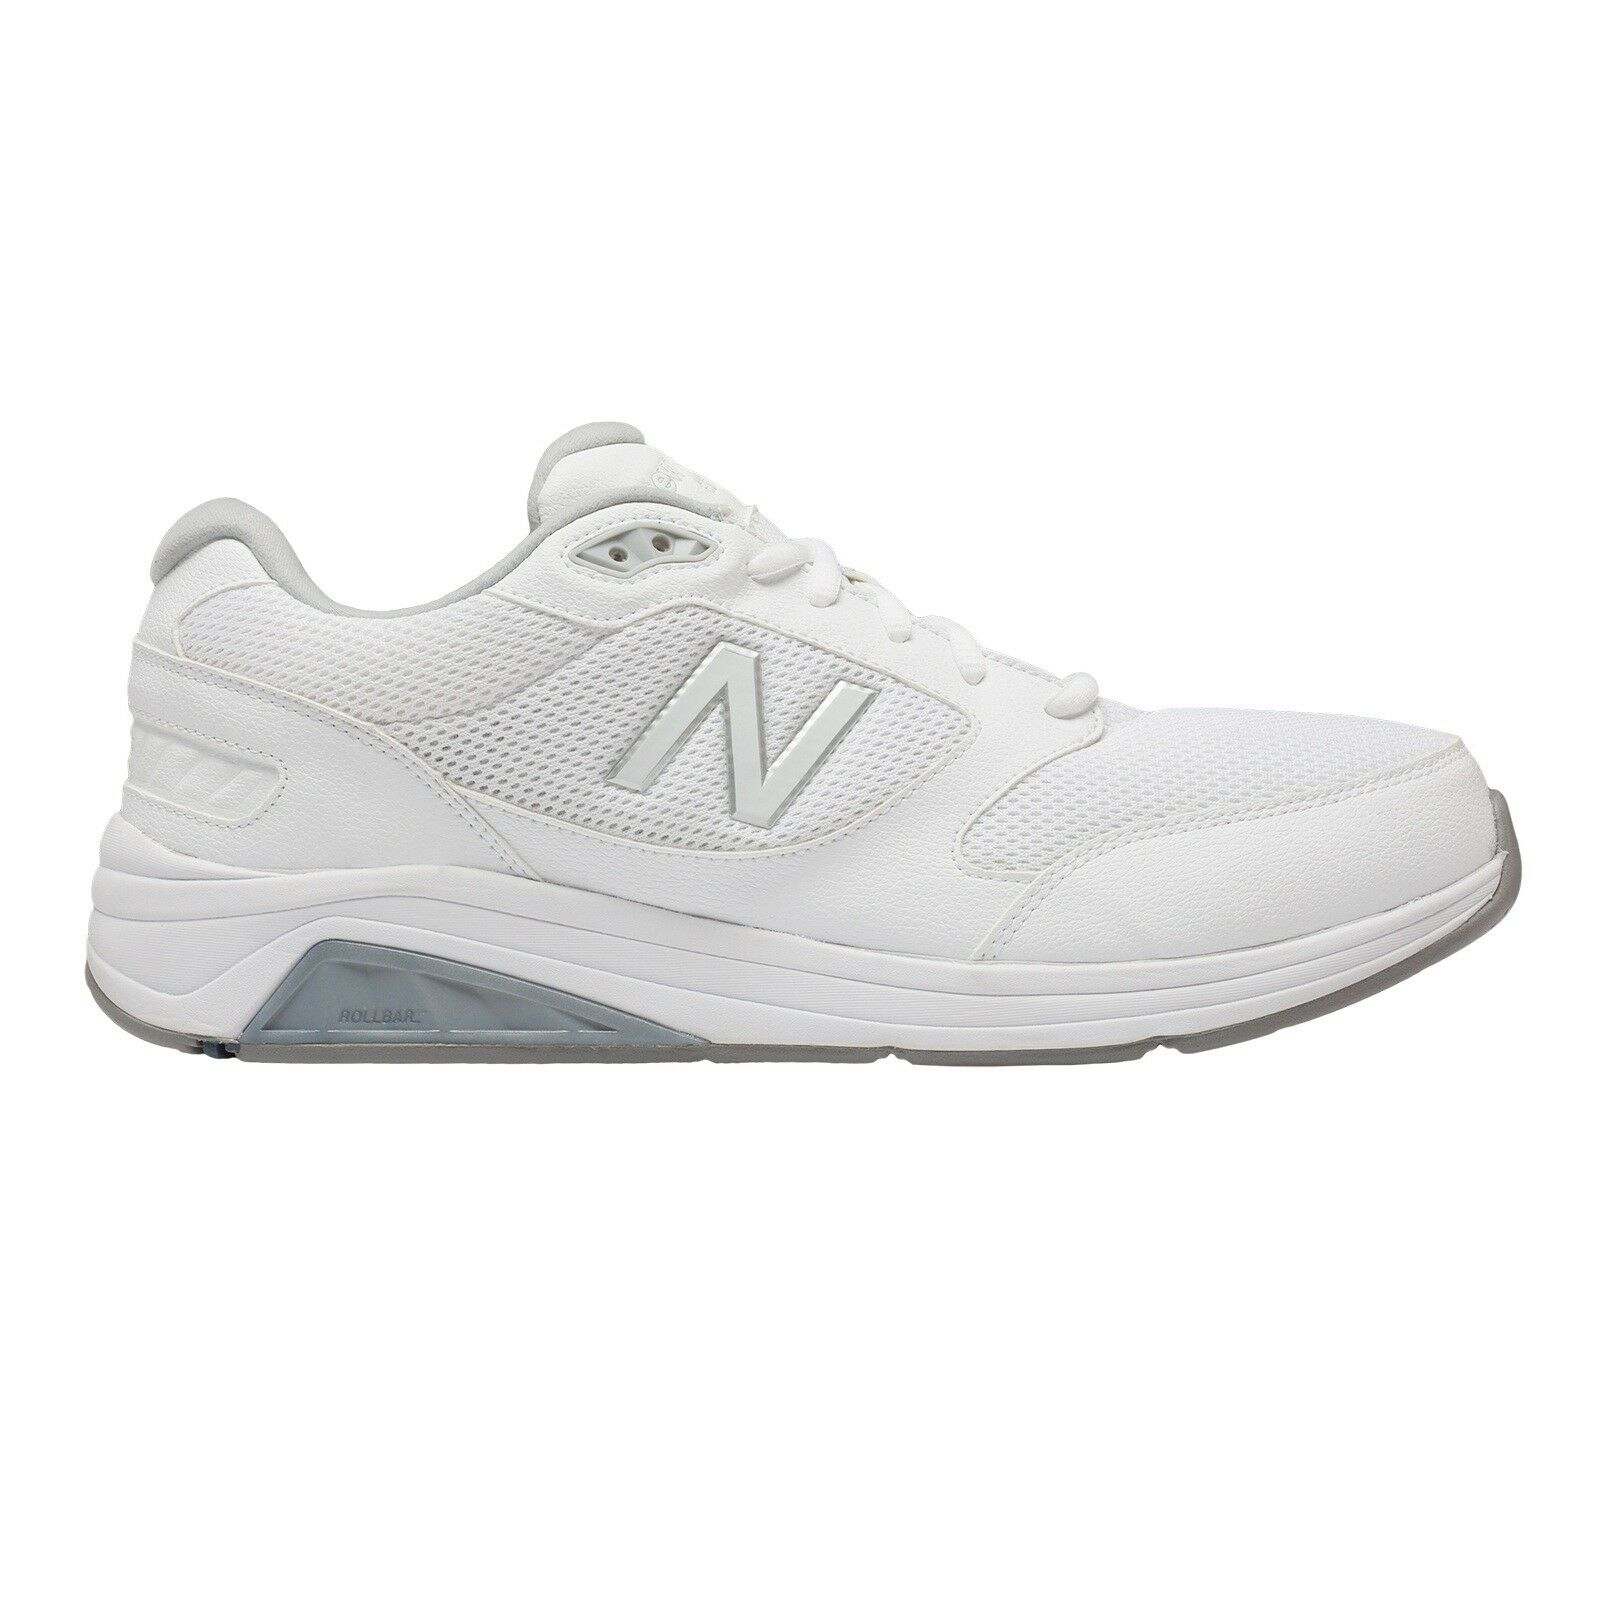 New Weiß Balance 928V2 Walking Schuhes Weiß New MW928WM2  Uomo Größe 9 4E d899bf